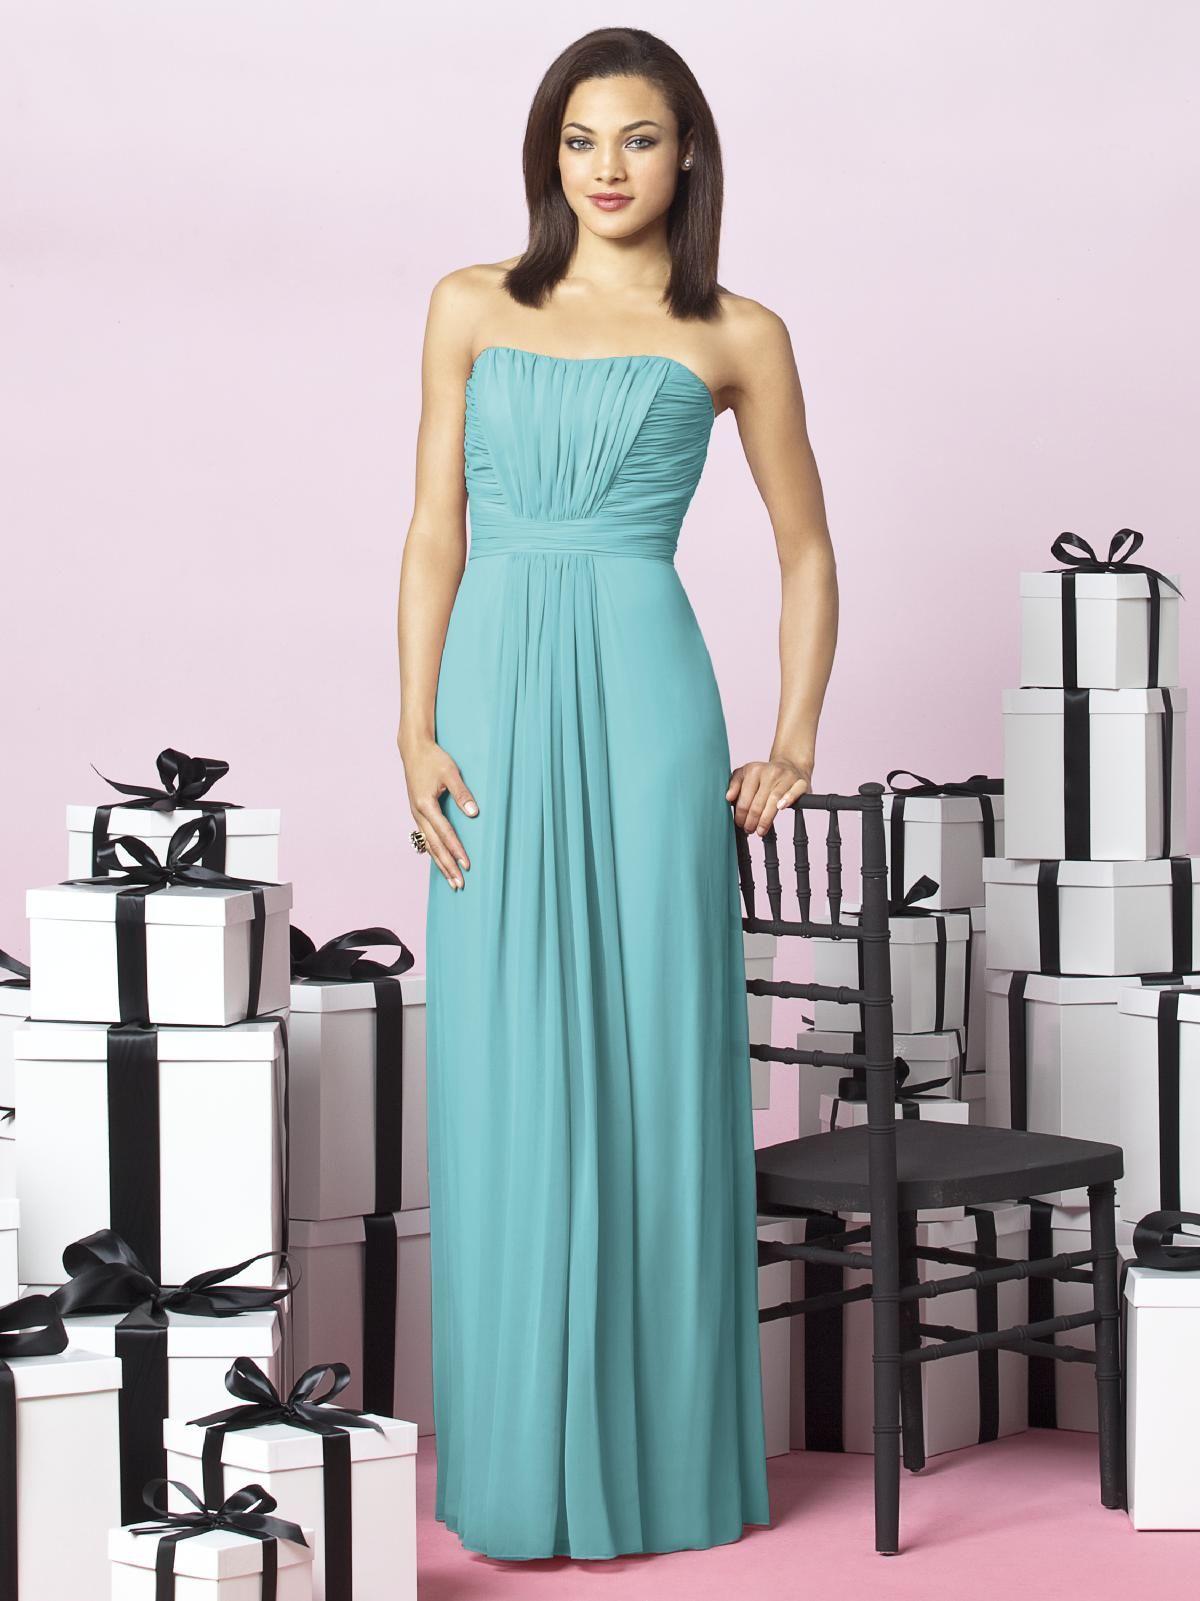 Chiffon, strapless full length bridesmaid dress